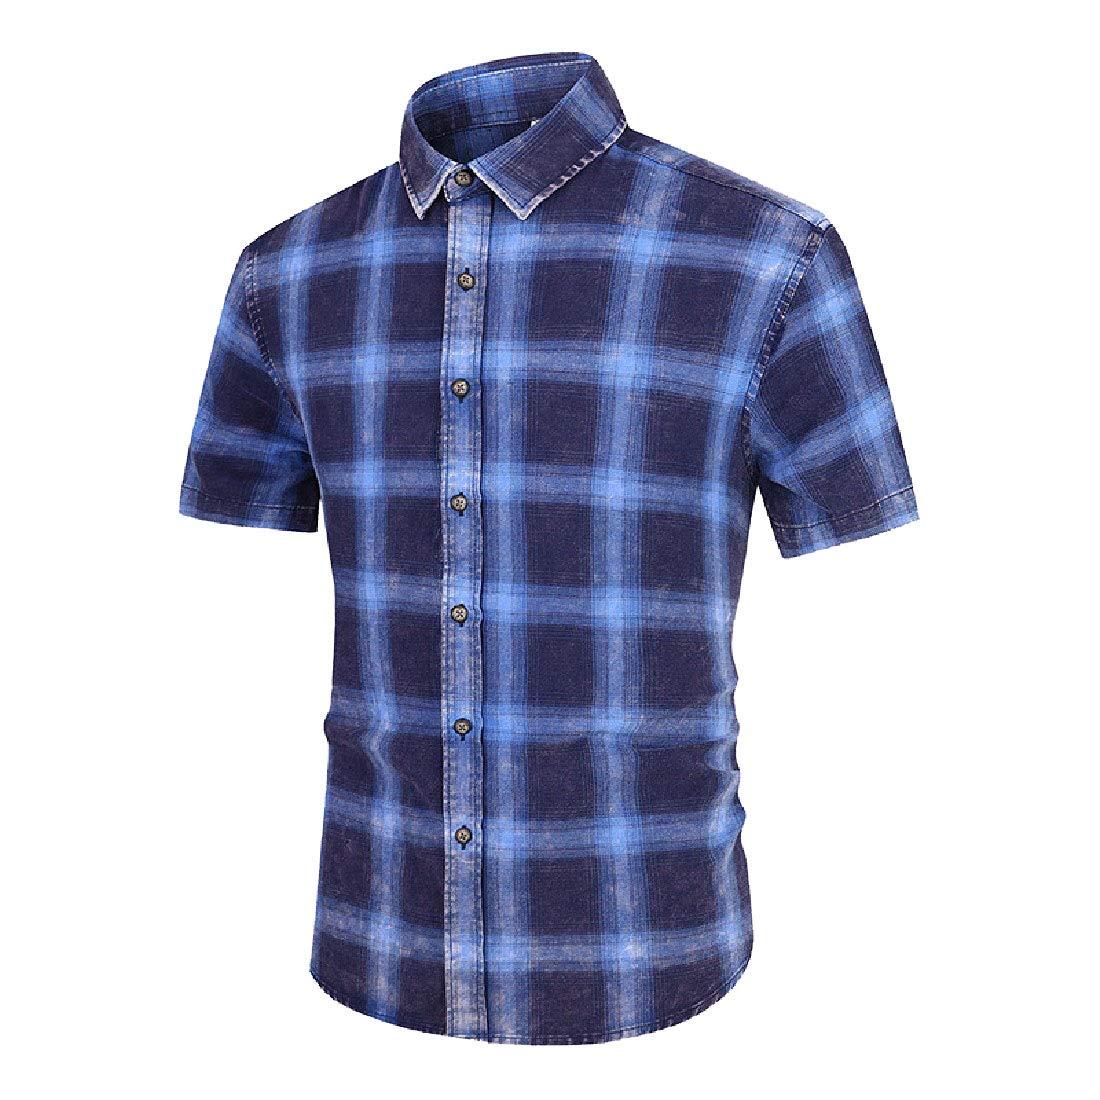 LianXiYou Mens Short-Sleeve Button Down Plaid Cotton Leisure T-Shirts Shirts